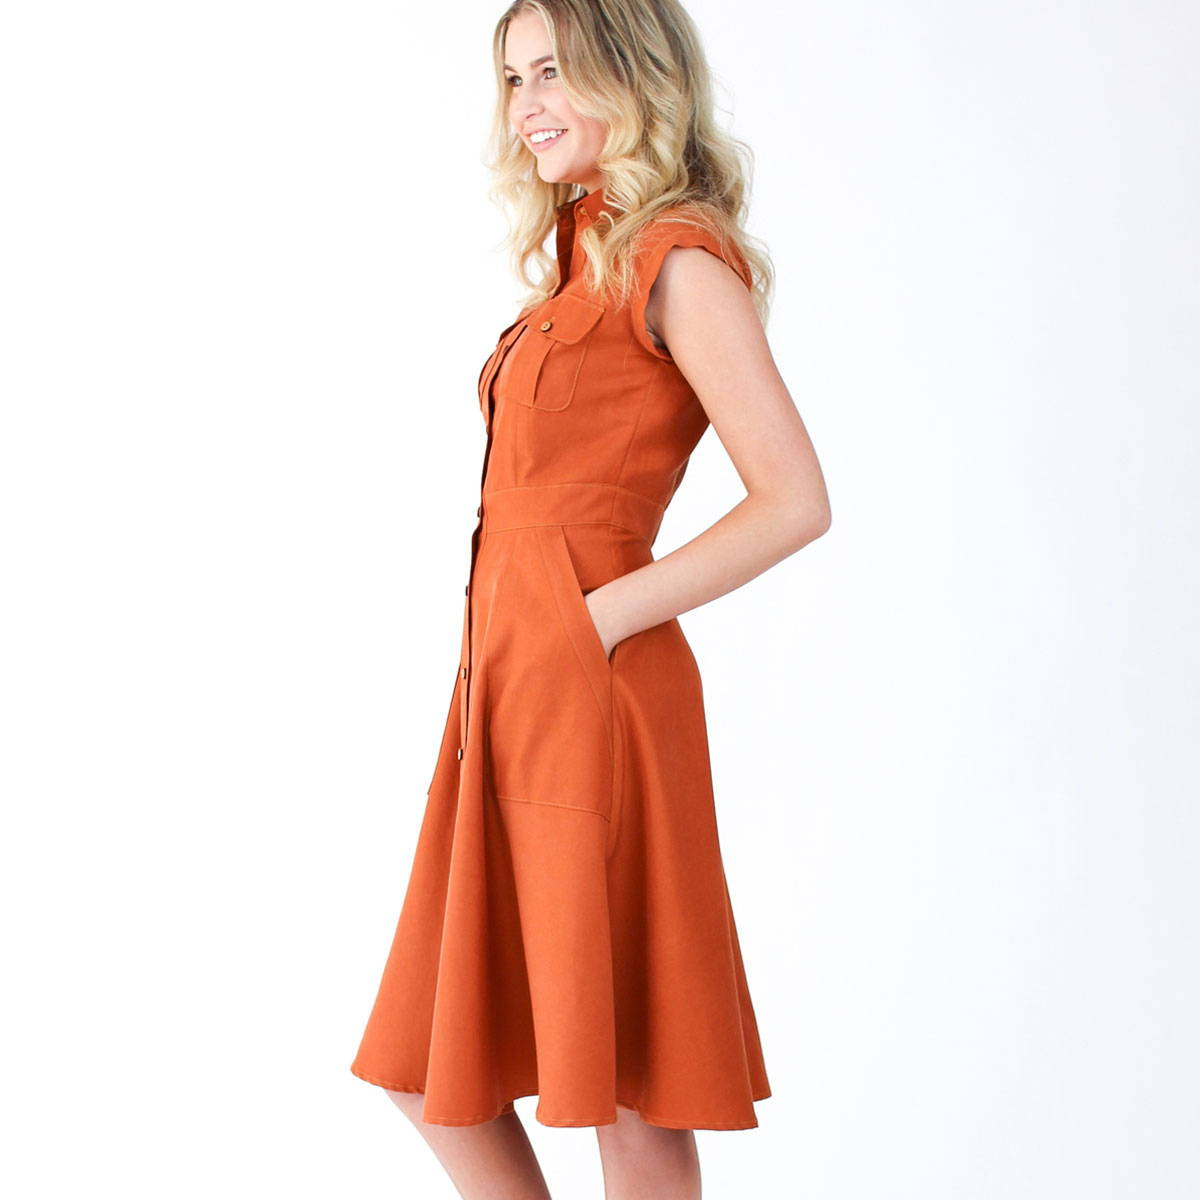 Matilda - Sew Sleeve Bands & Skirt